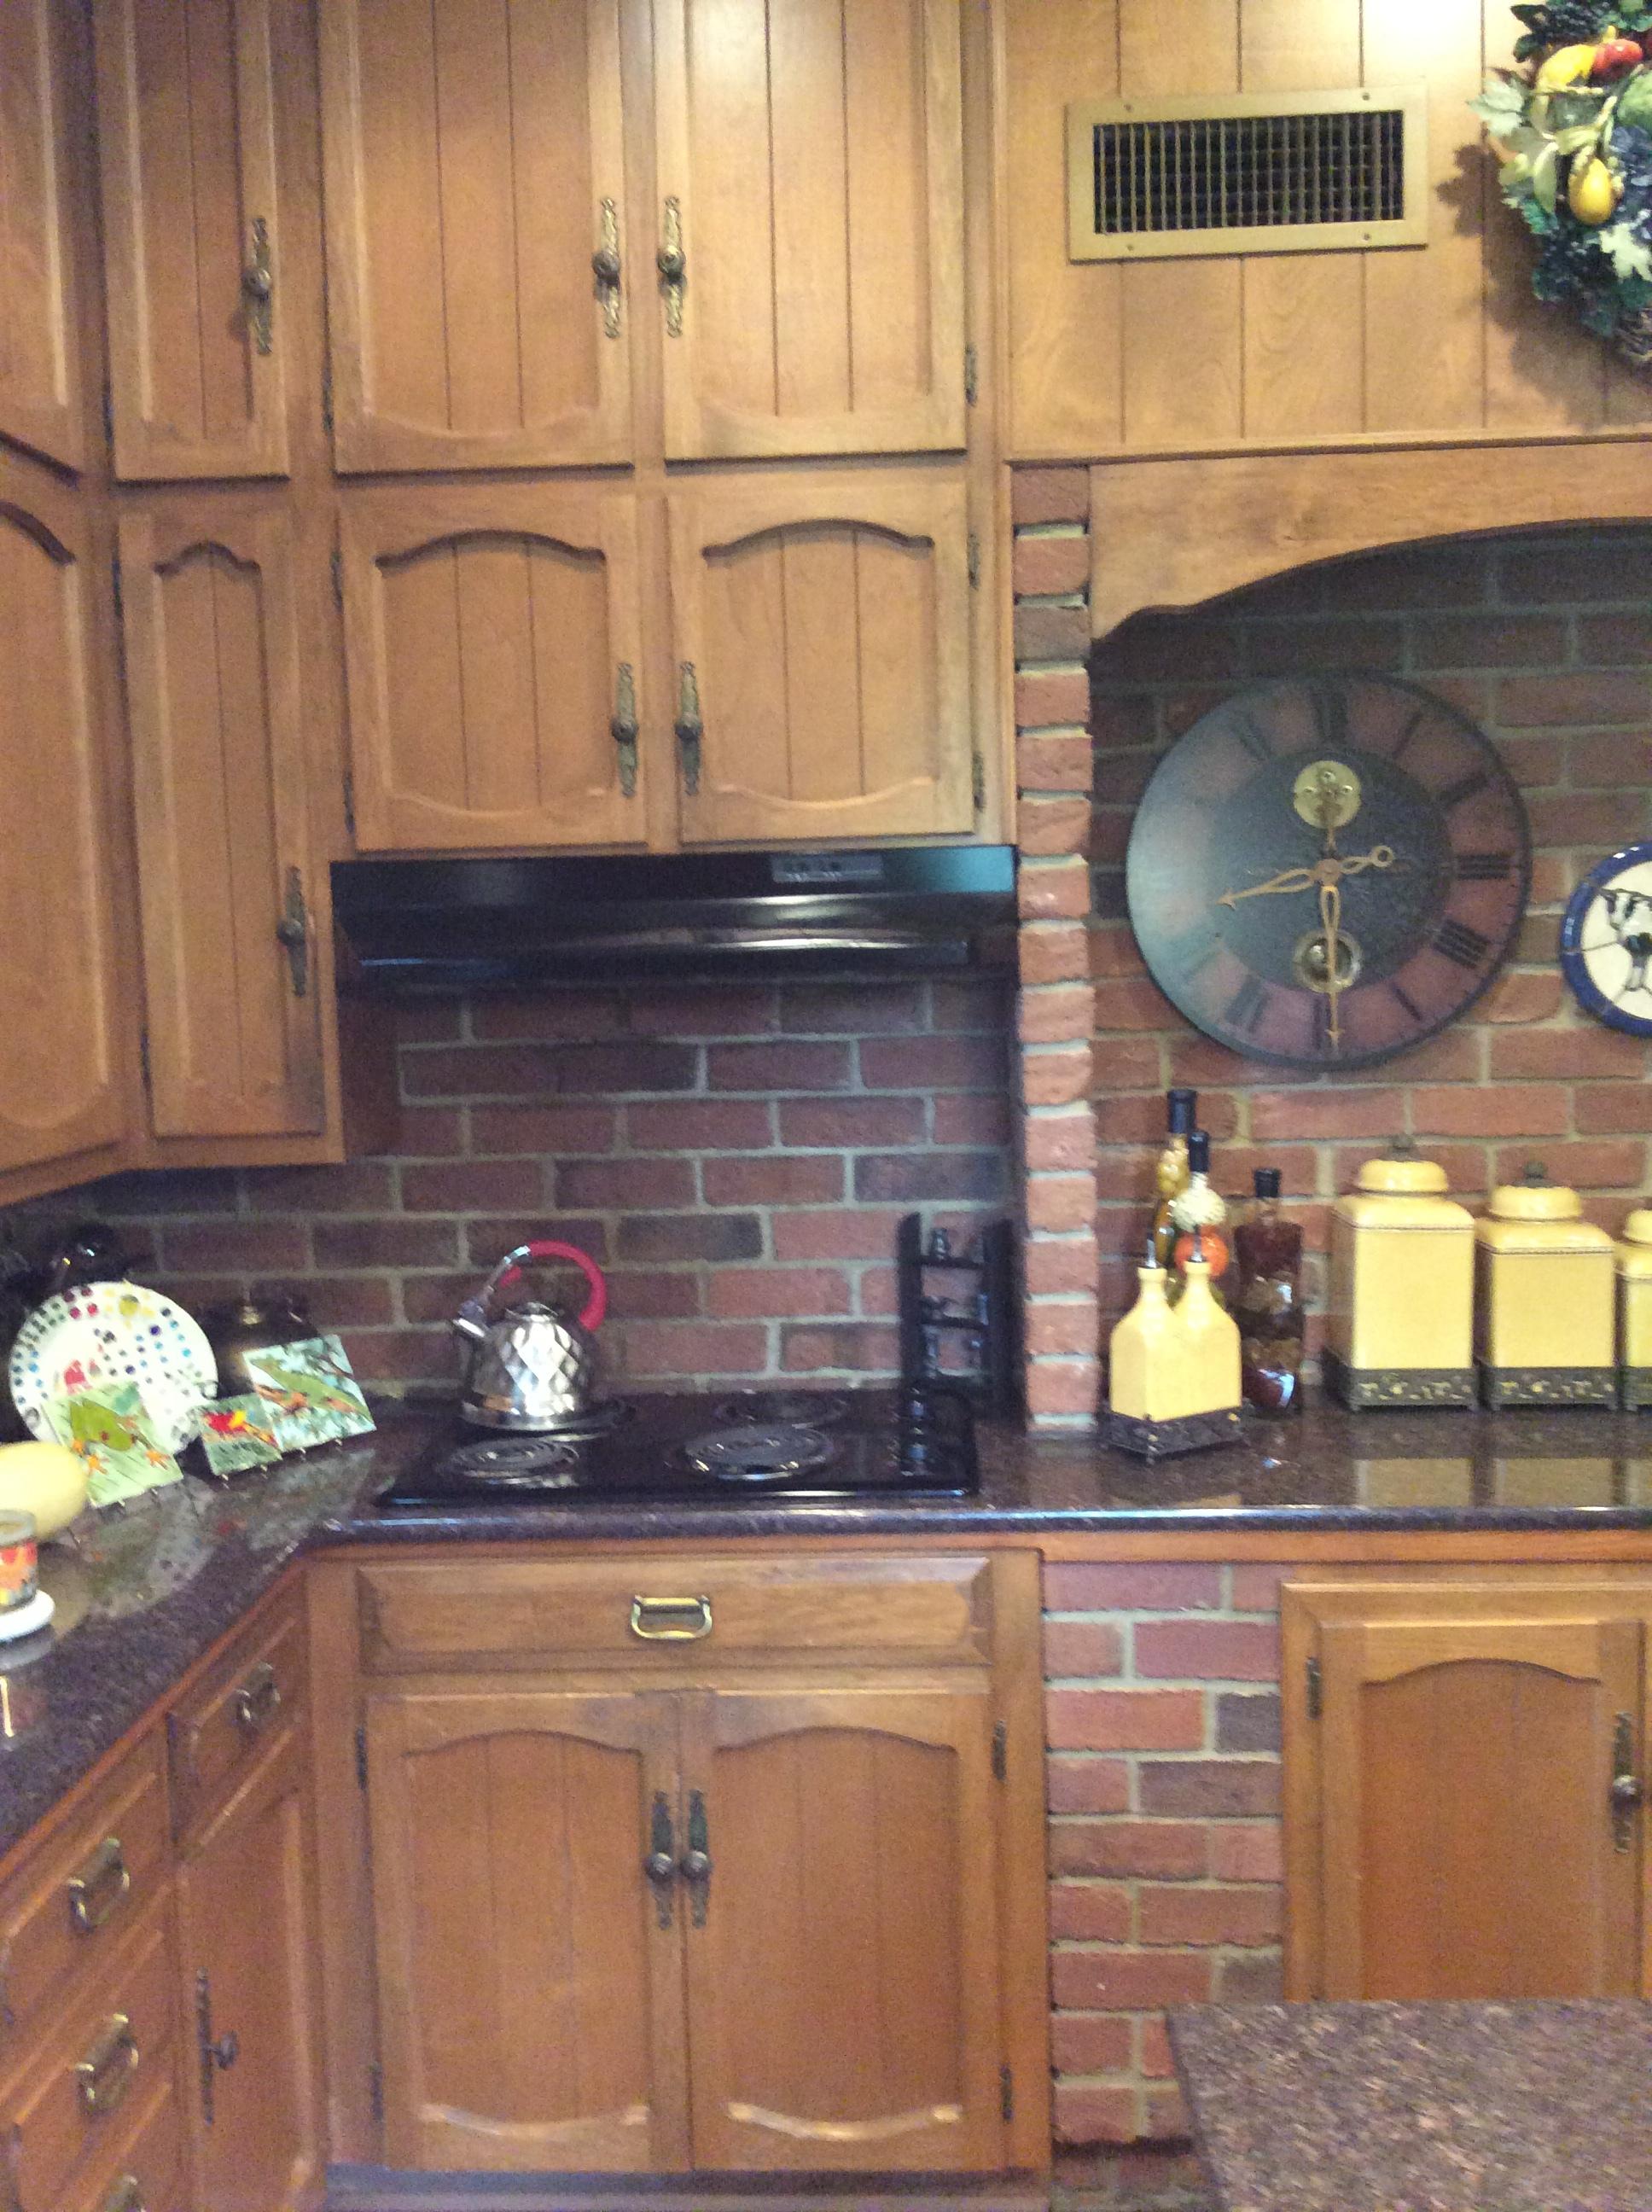 Kitchen Cabinets - Before (Original Range Placement)